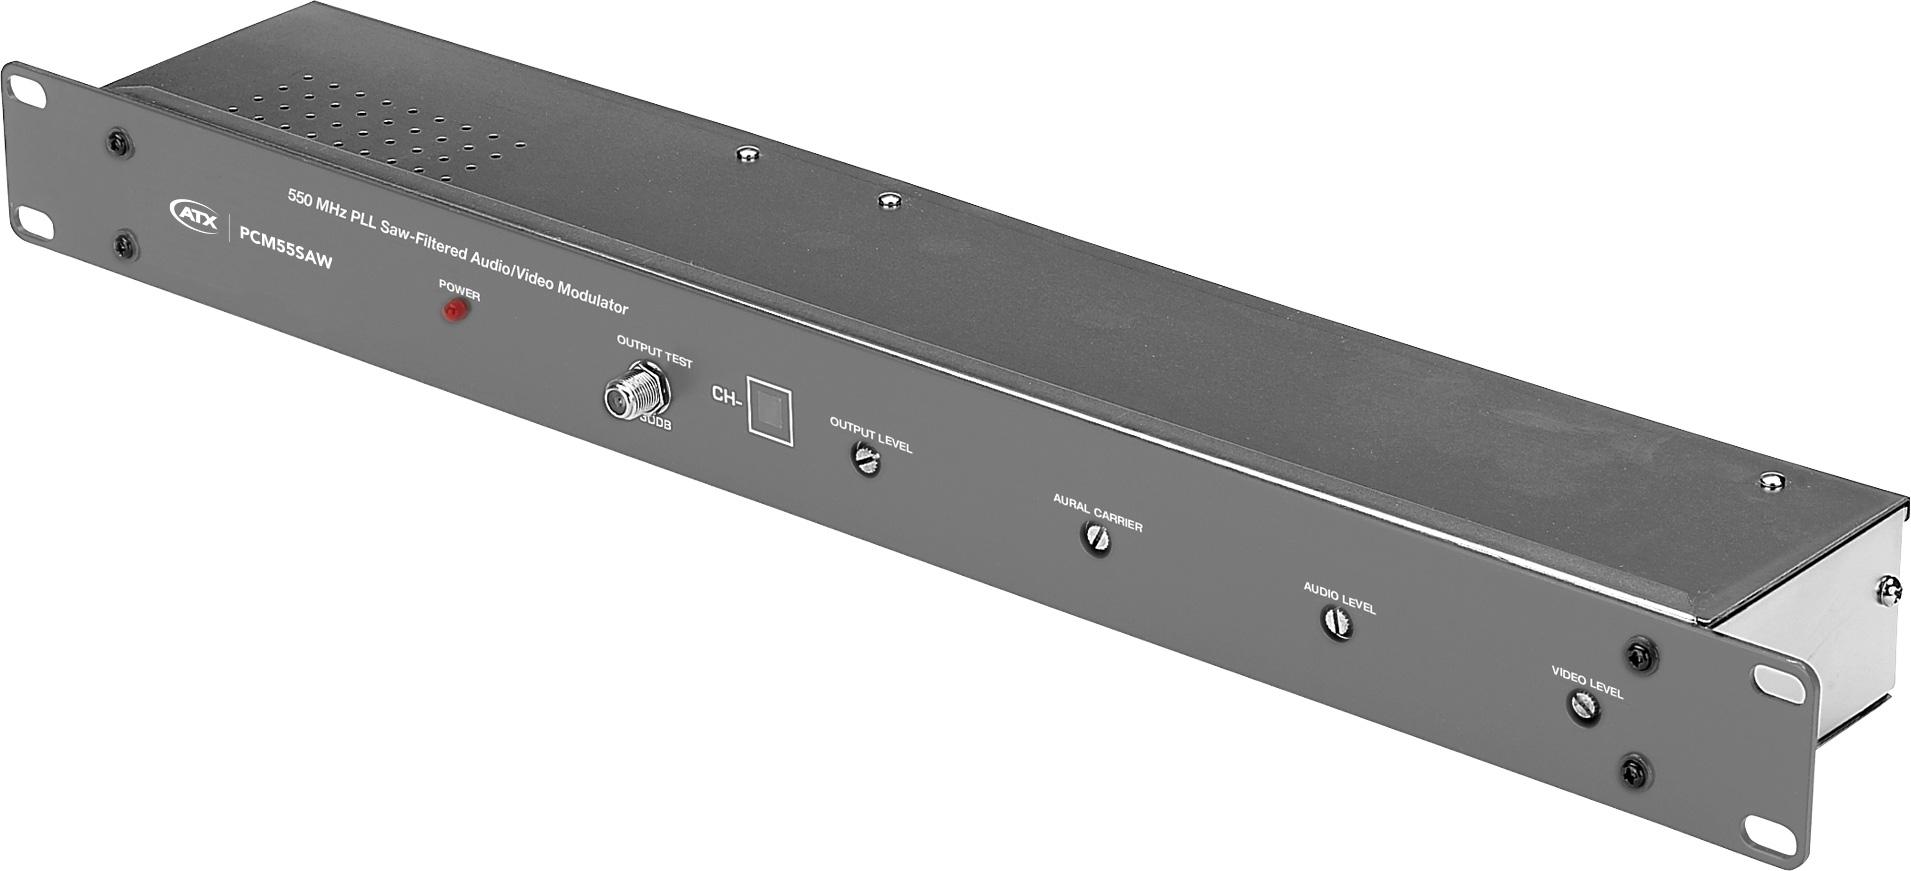 1 Channel Crystal A/V Modulator - Channel 18 PM-PCM55SAW-18